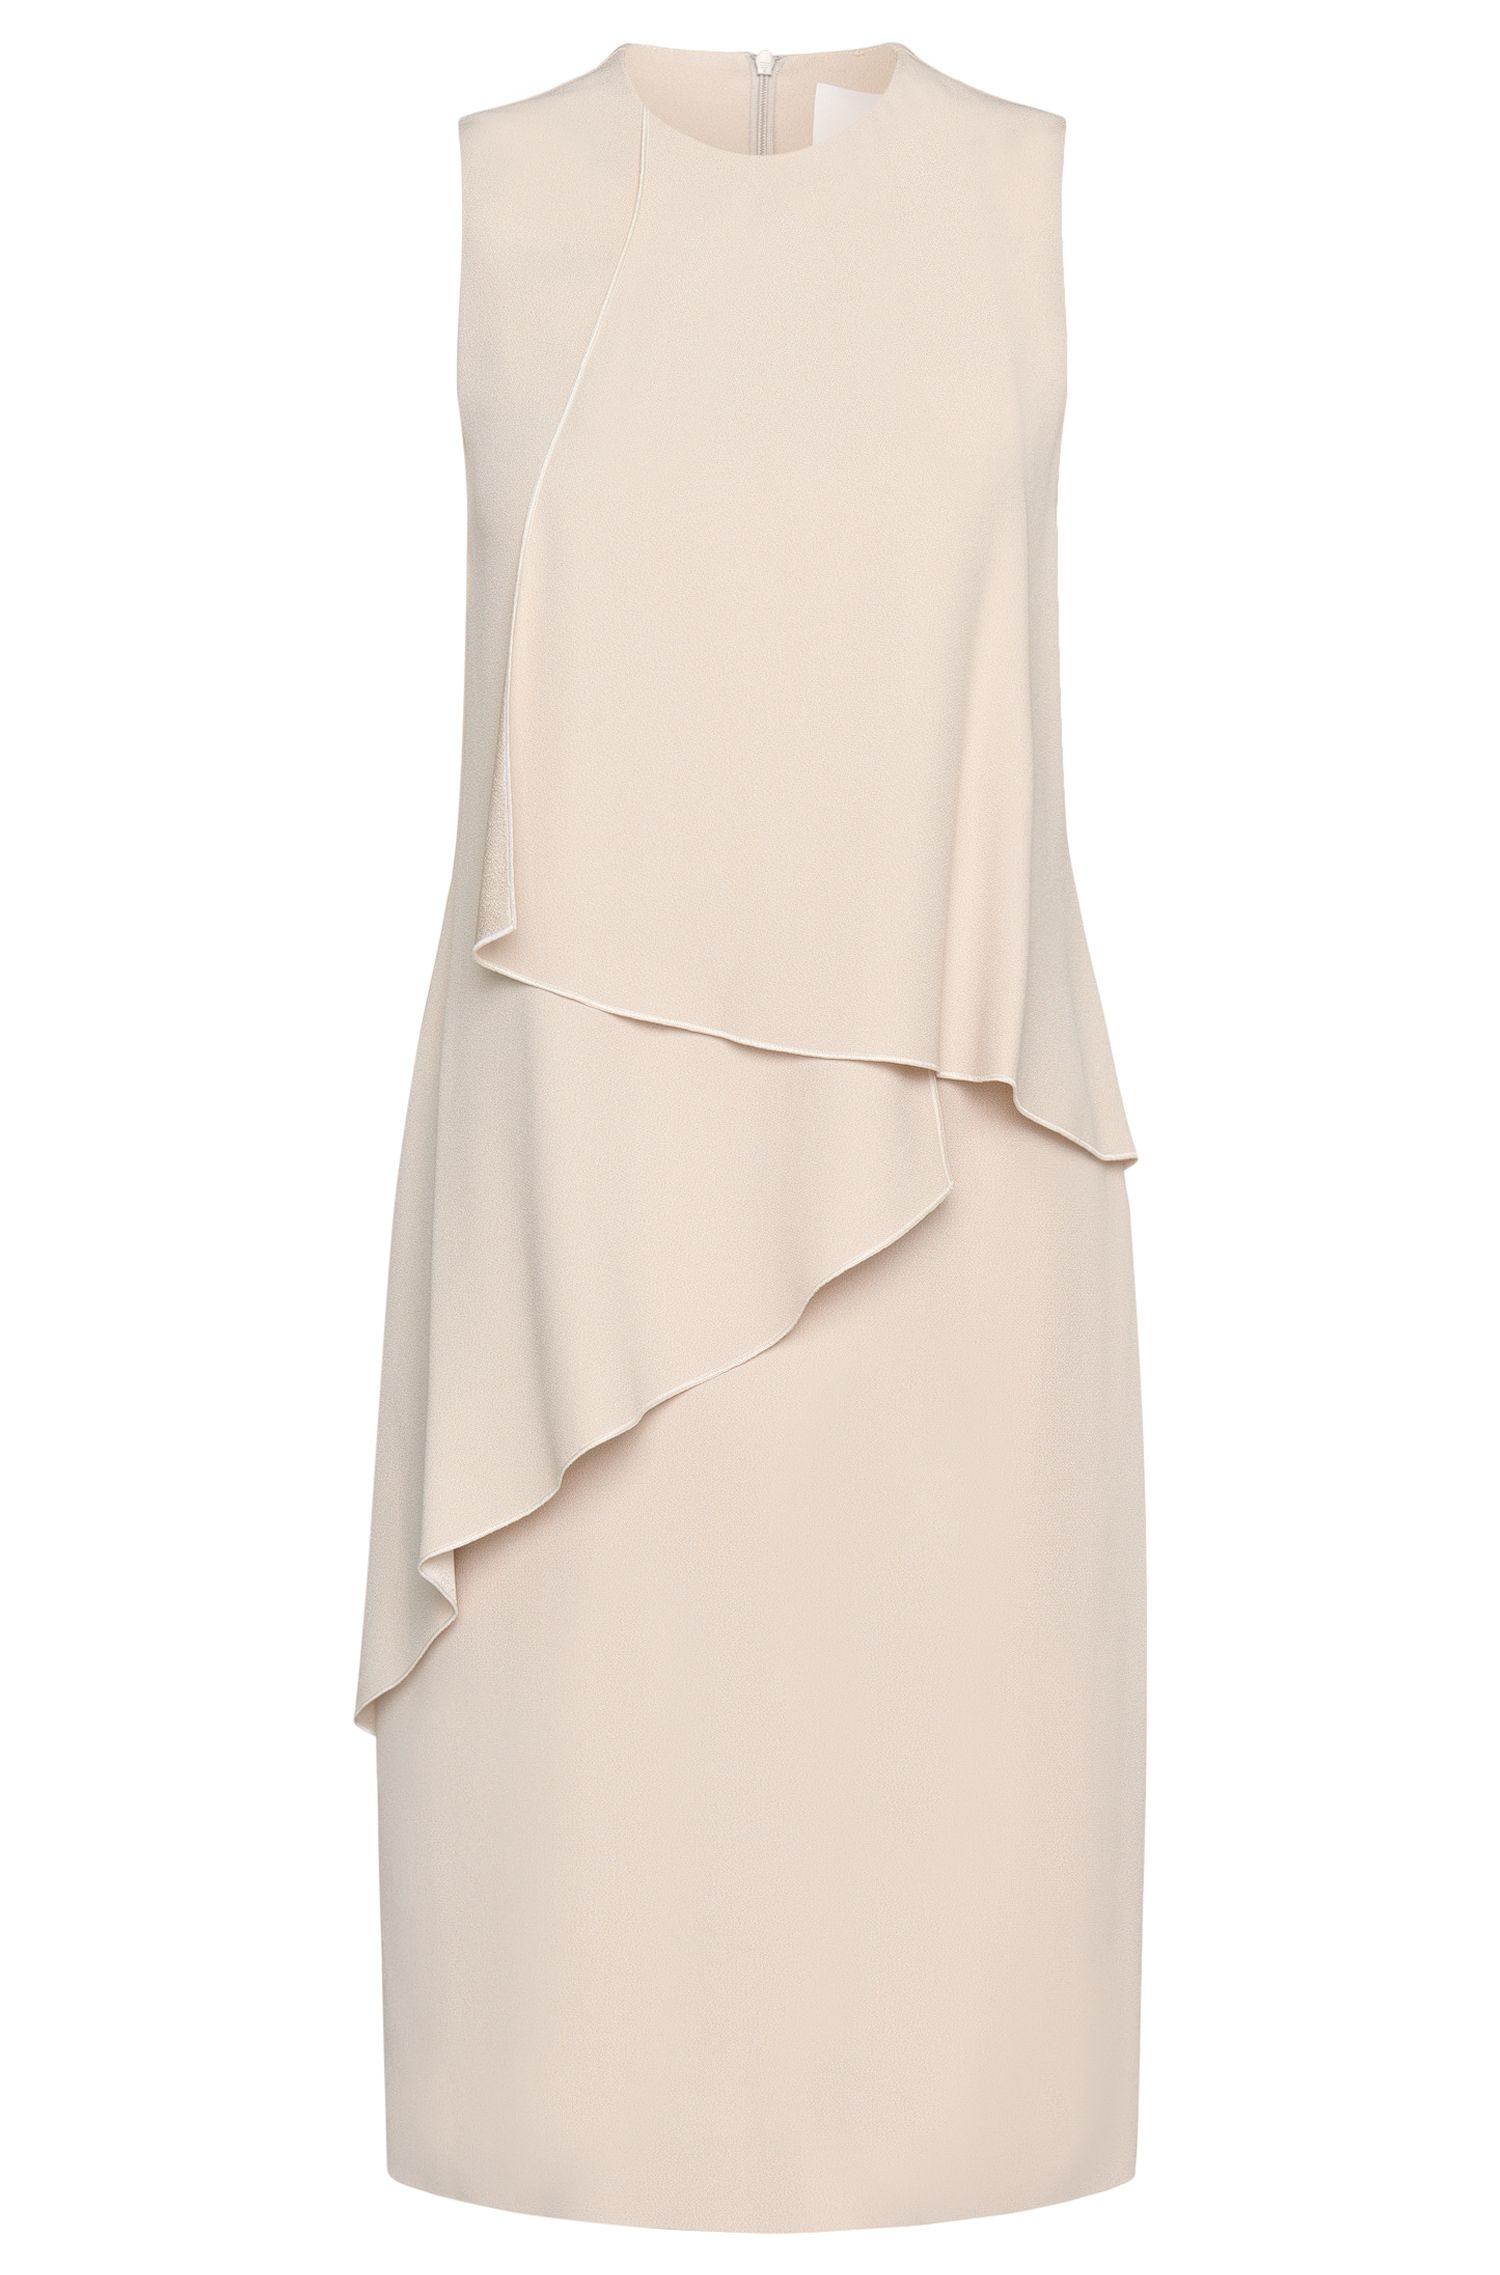 'Dalynea'   Crepe Sating Layered Flounce Dress